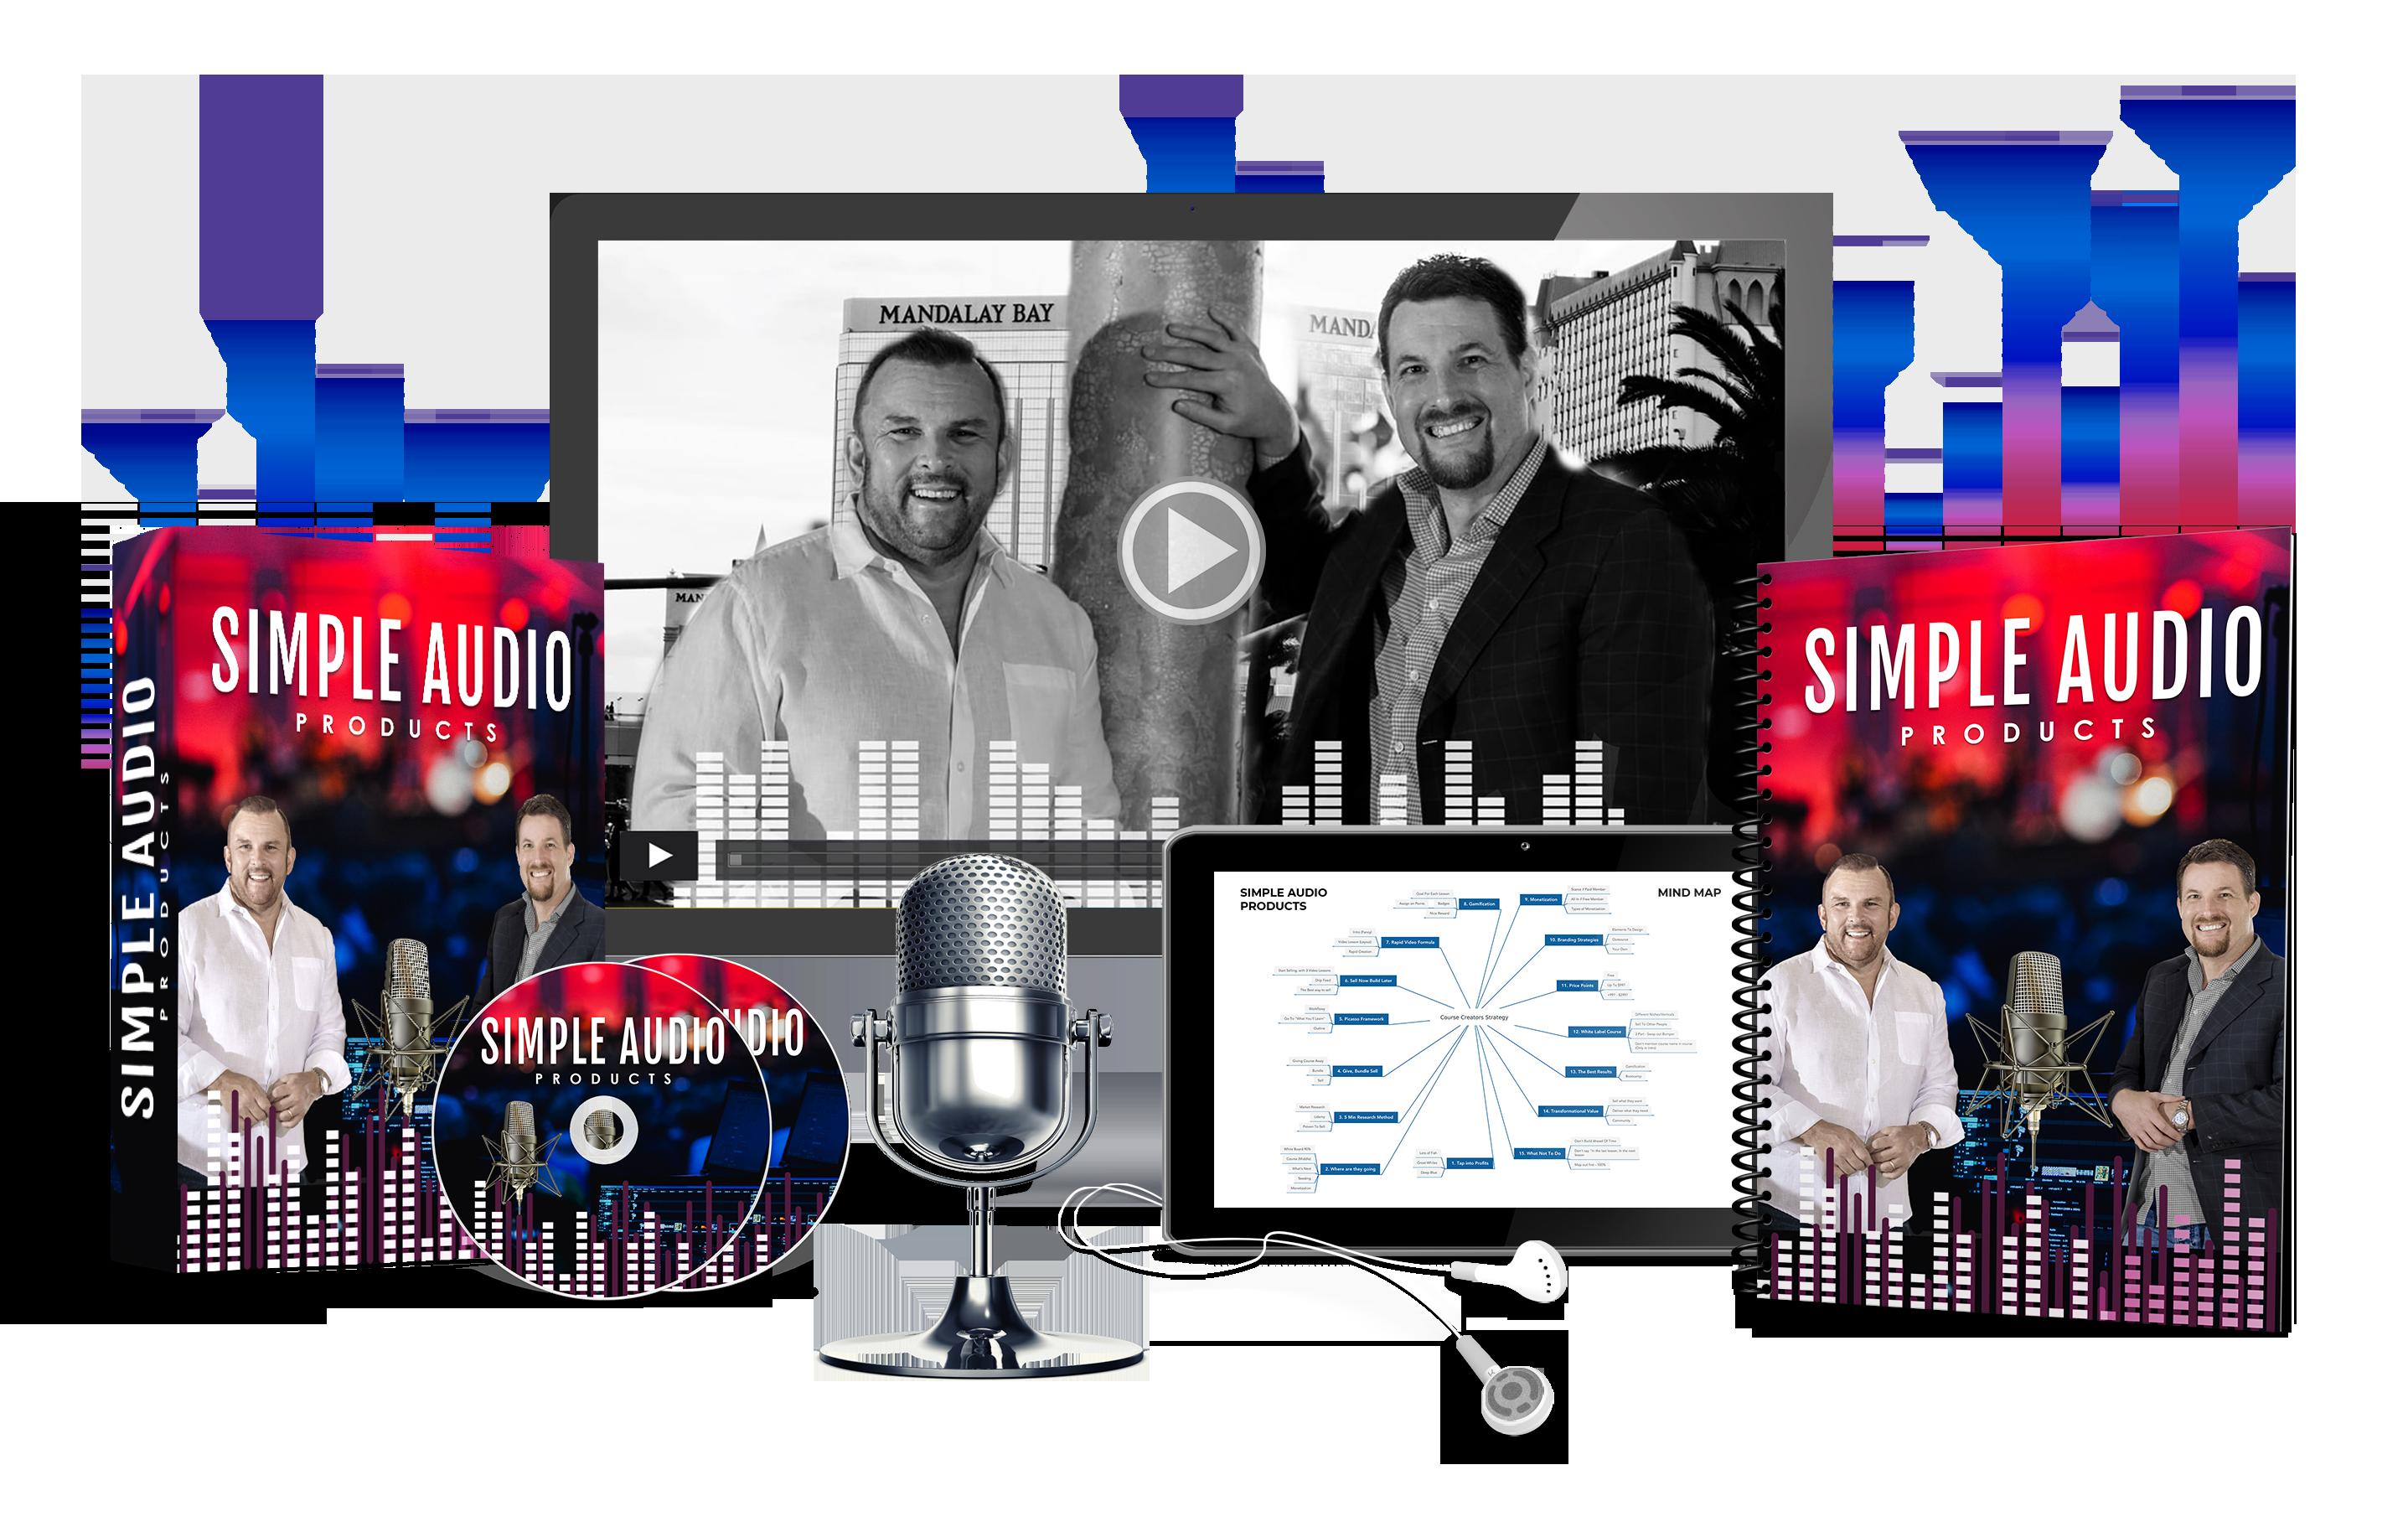 Ihr Bonus Nr 1: Simple Audio Product